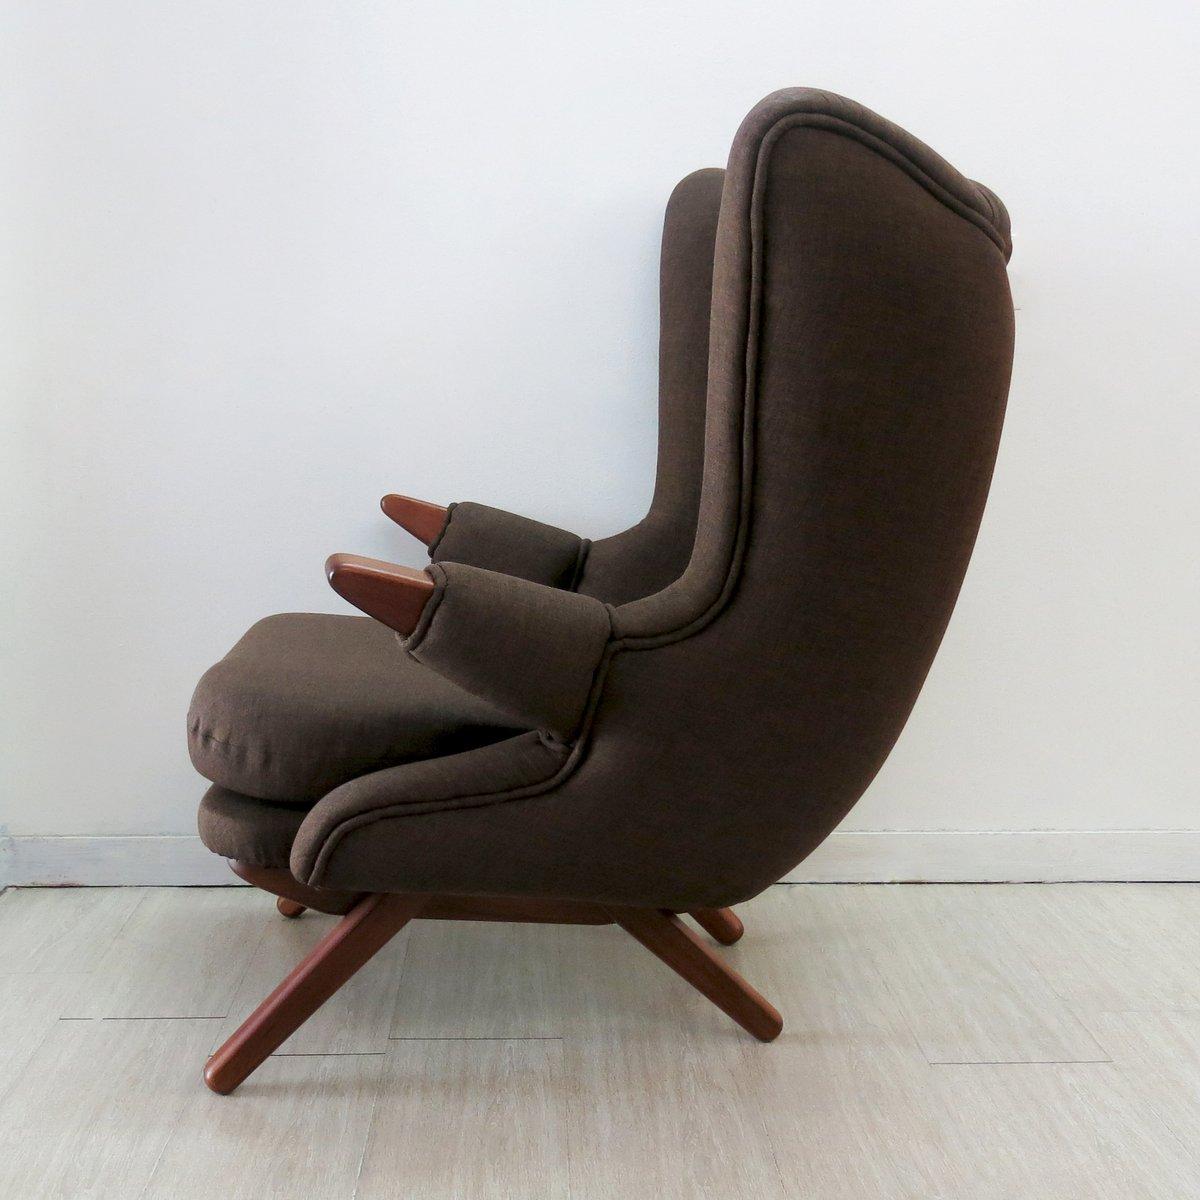 svend skipper lounge sessel mit fu hocker von skippers m bler bei pamono kaufen. Black Bedroom Furniture Sets. Home Design Ideas